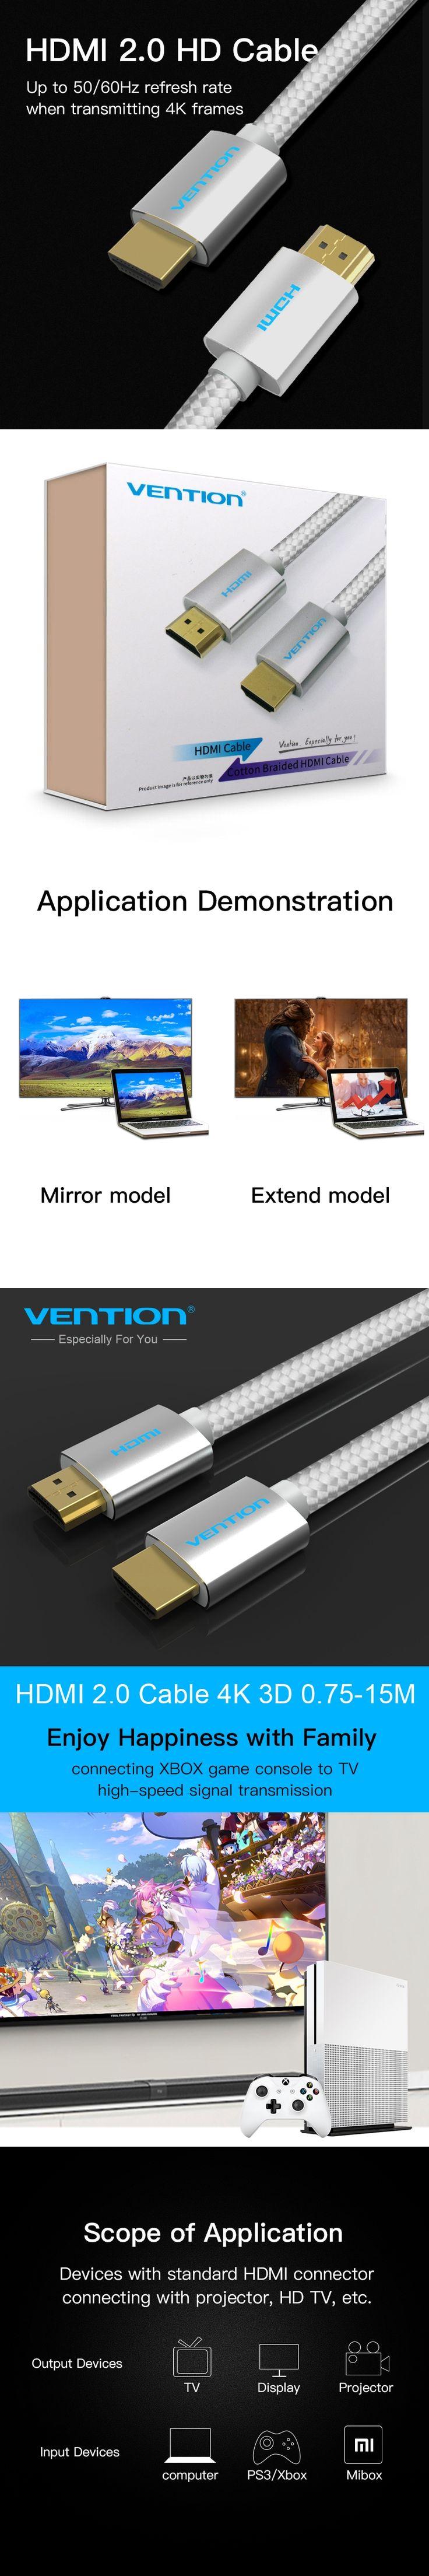 14 Best Gopro Images On Pinterest Kabel Data Usb 30 To Type C 3a Golden Belt Series 15m Black Red Vention Hdmi 20 Cable Gold Plated 4k2k 60hz 1 15 2